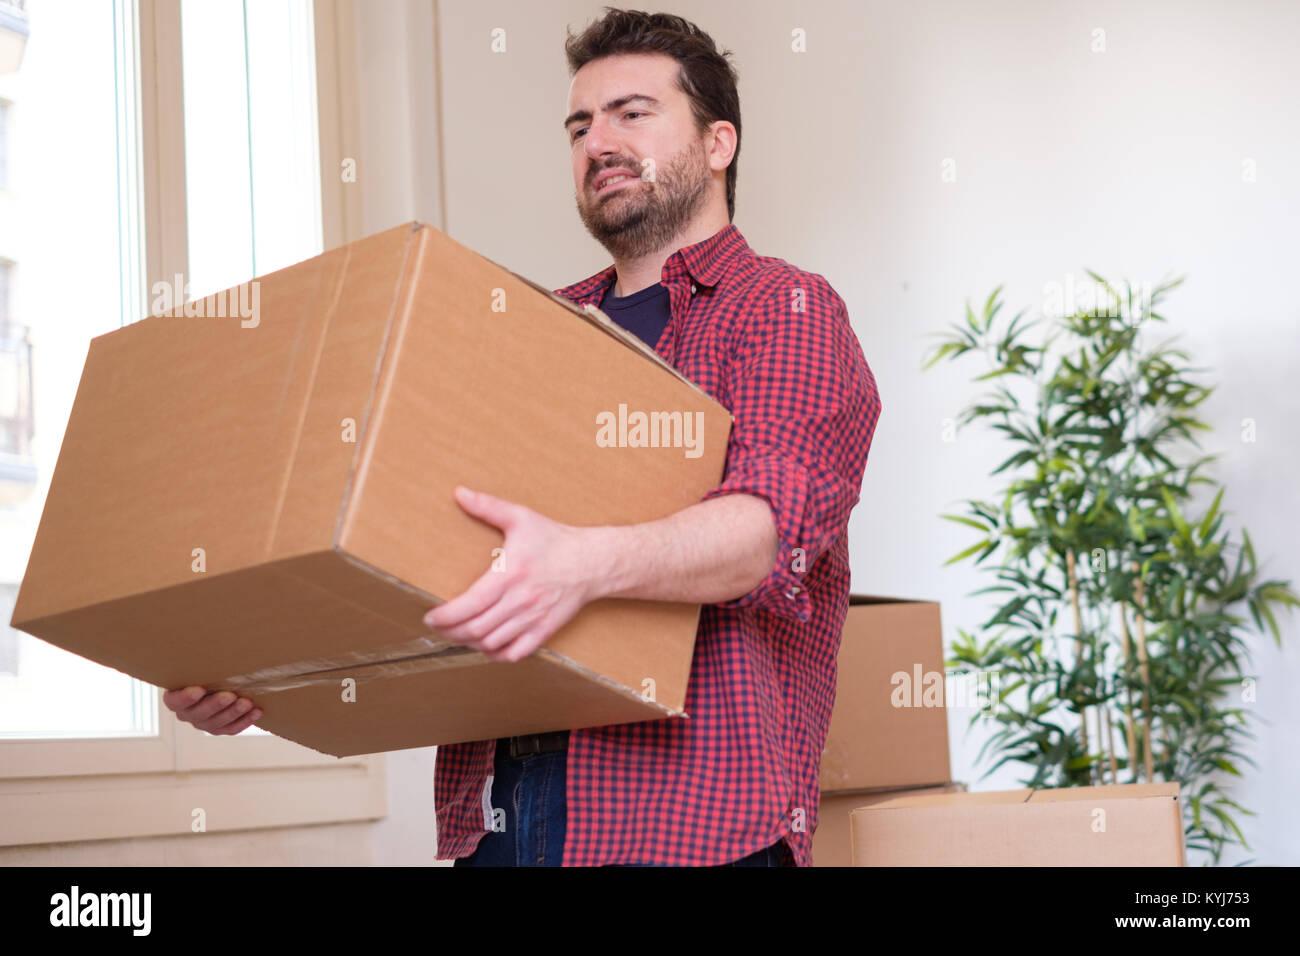 Man feeling back ache cramp moving heavy boxes - Stock Image